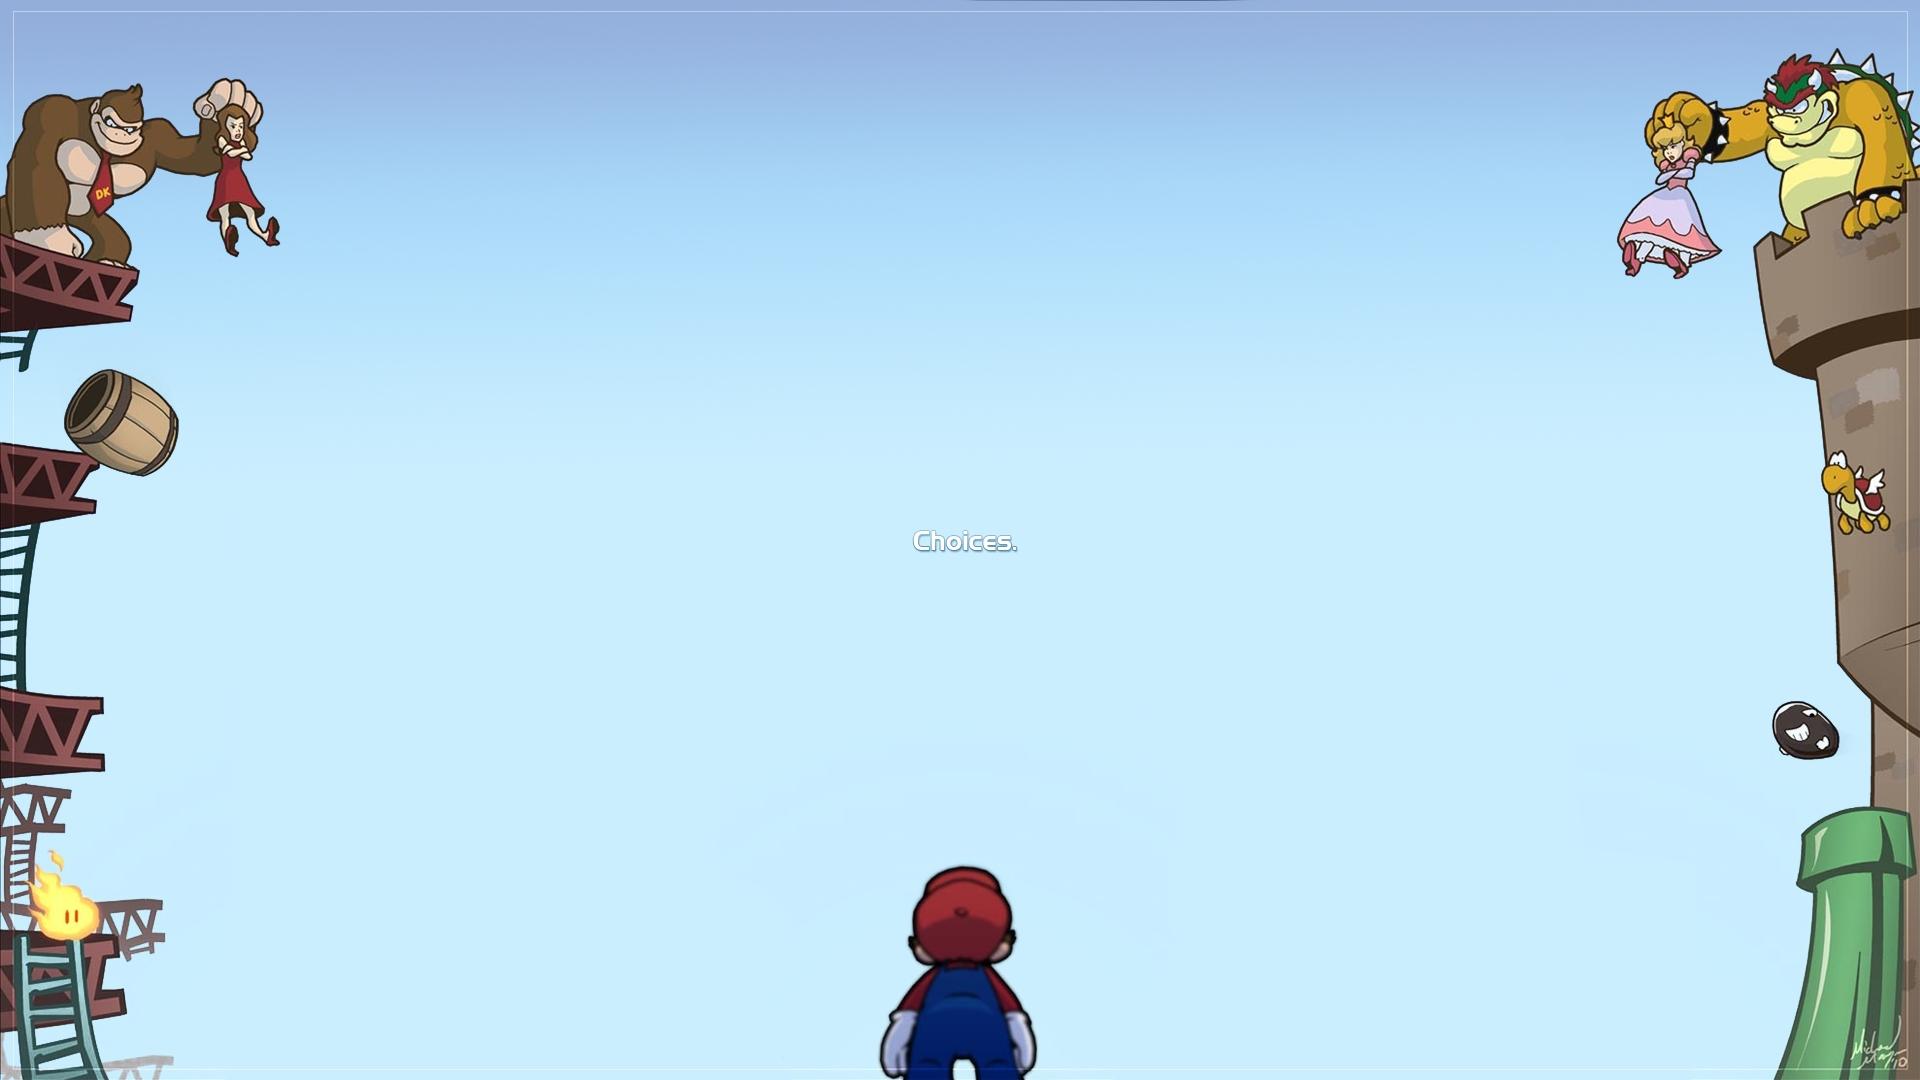 Super Mario Bros. Full HD Papel De Parede And Background